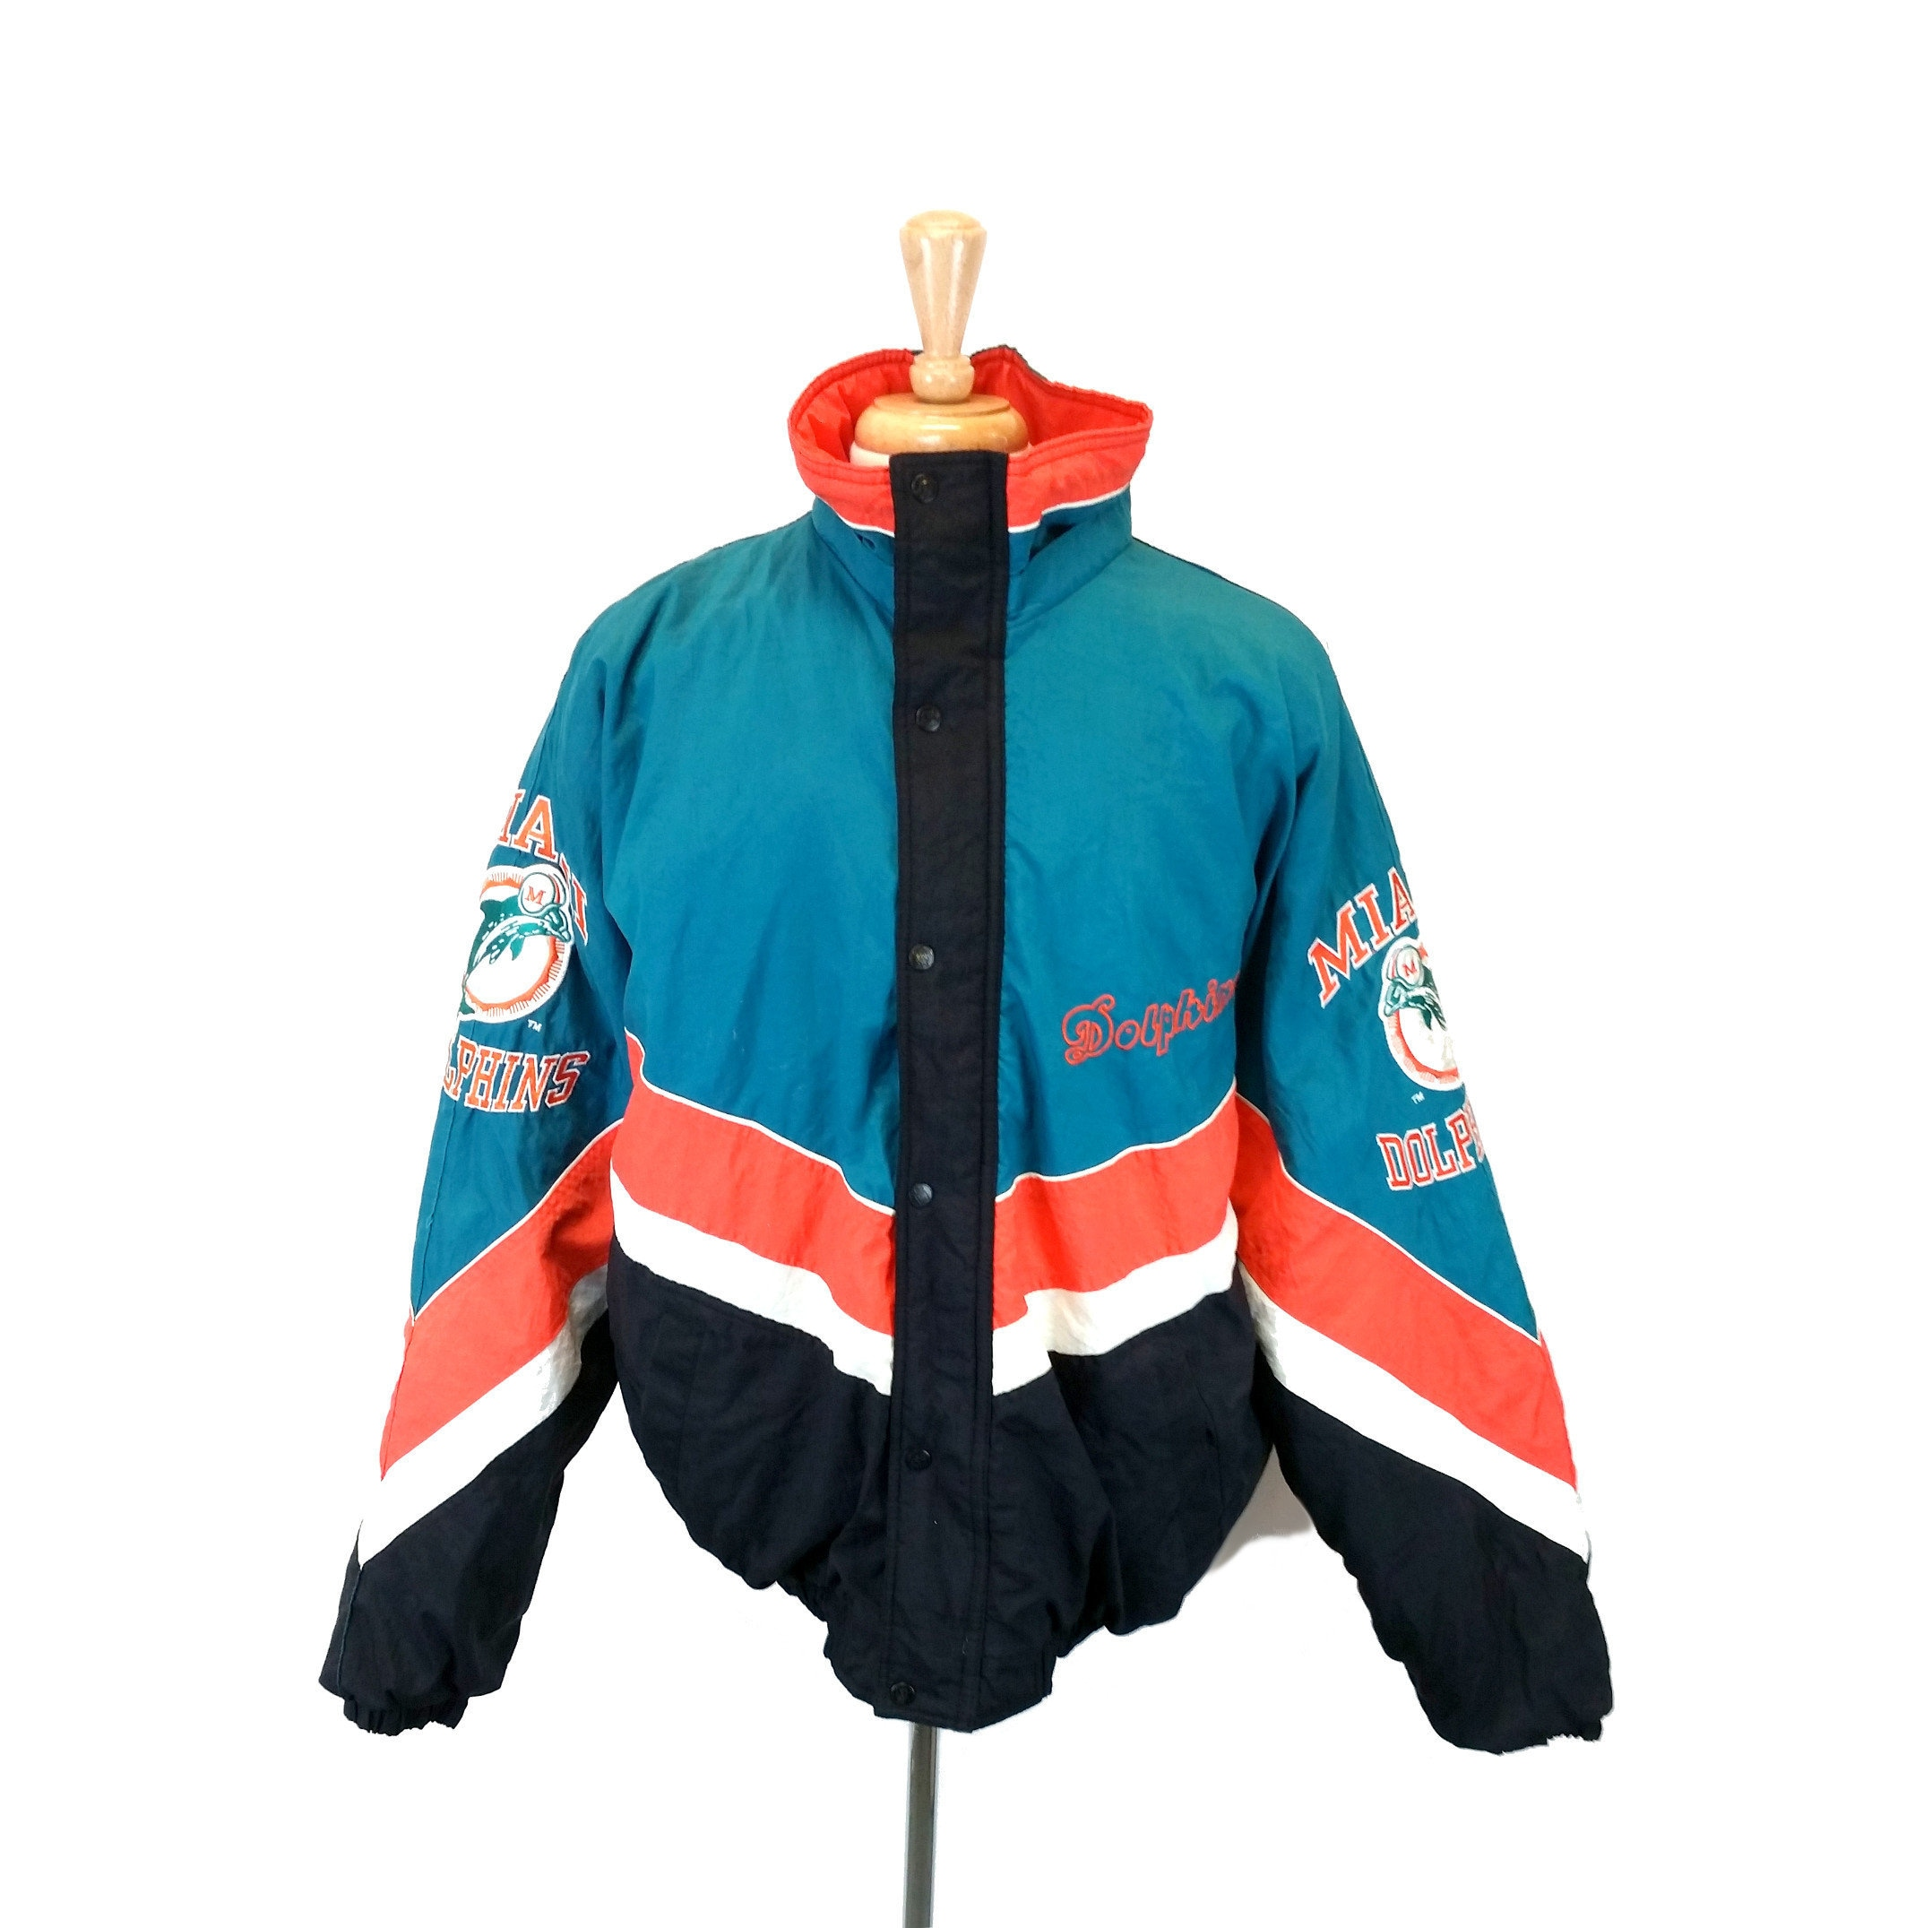 wholesale dealer 15290 cea3d Starter Jacket Miami Dolphins, 1990s Football Jacket, Teal ...